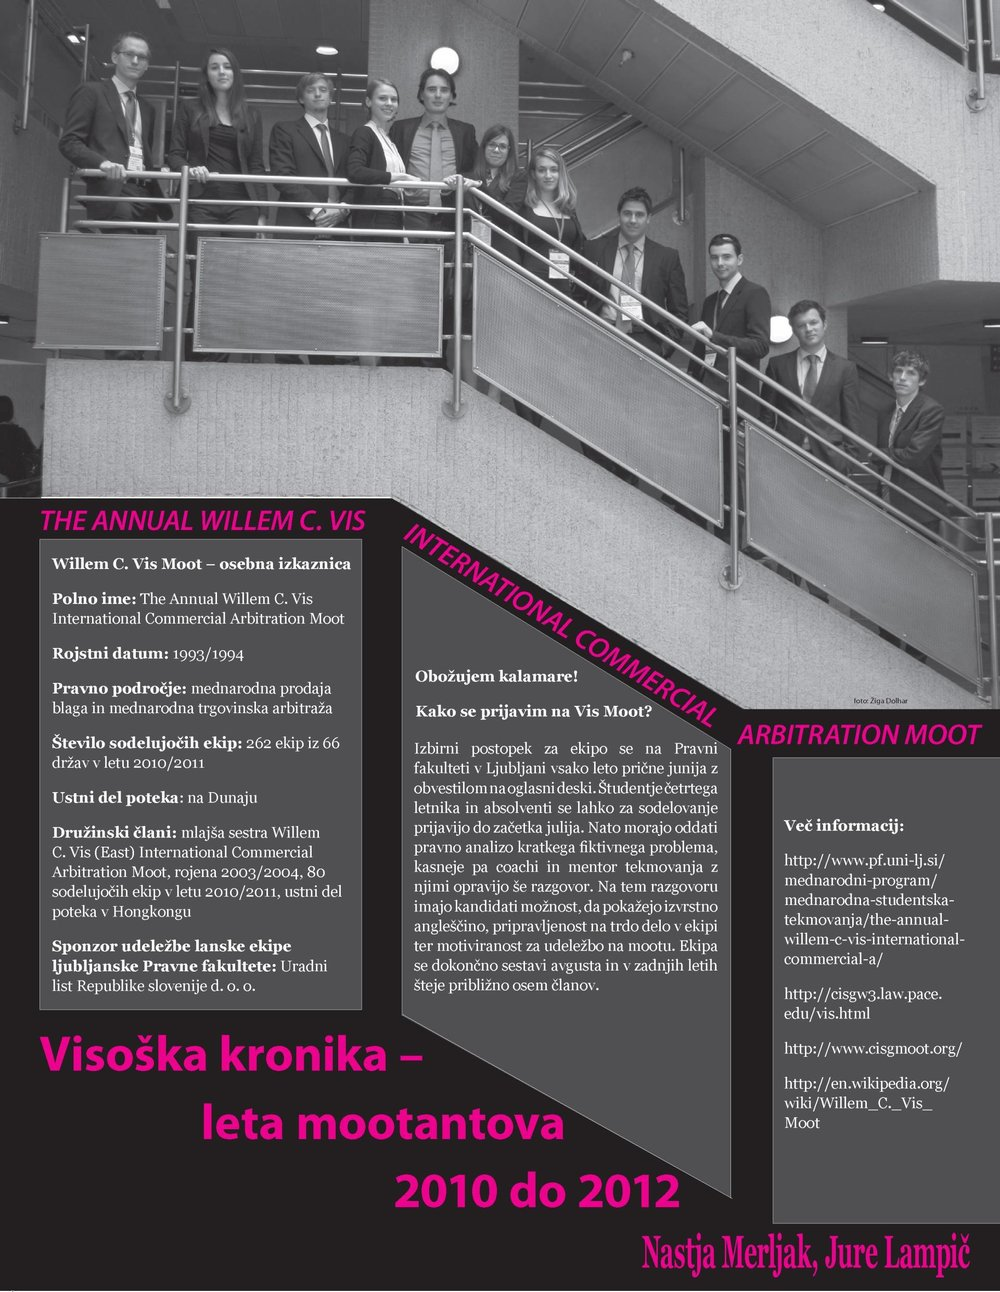 visoska+kronika+leta+mootantova+2010+do+2012+clanek+pamfil.jpg